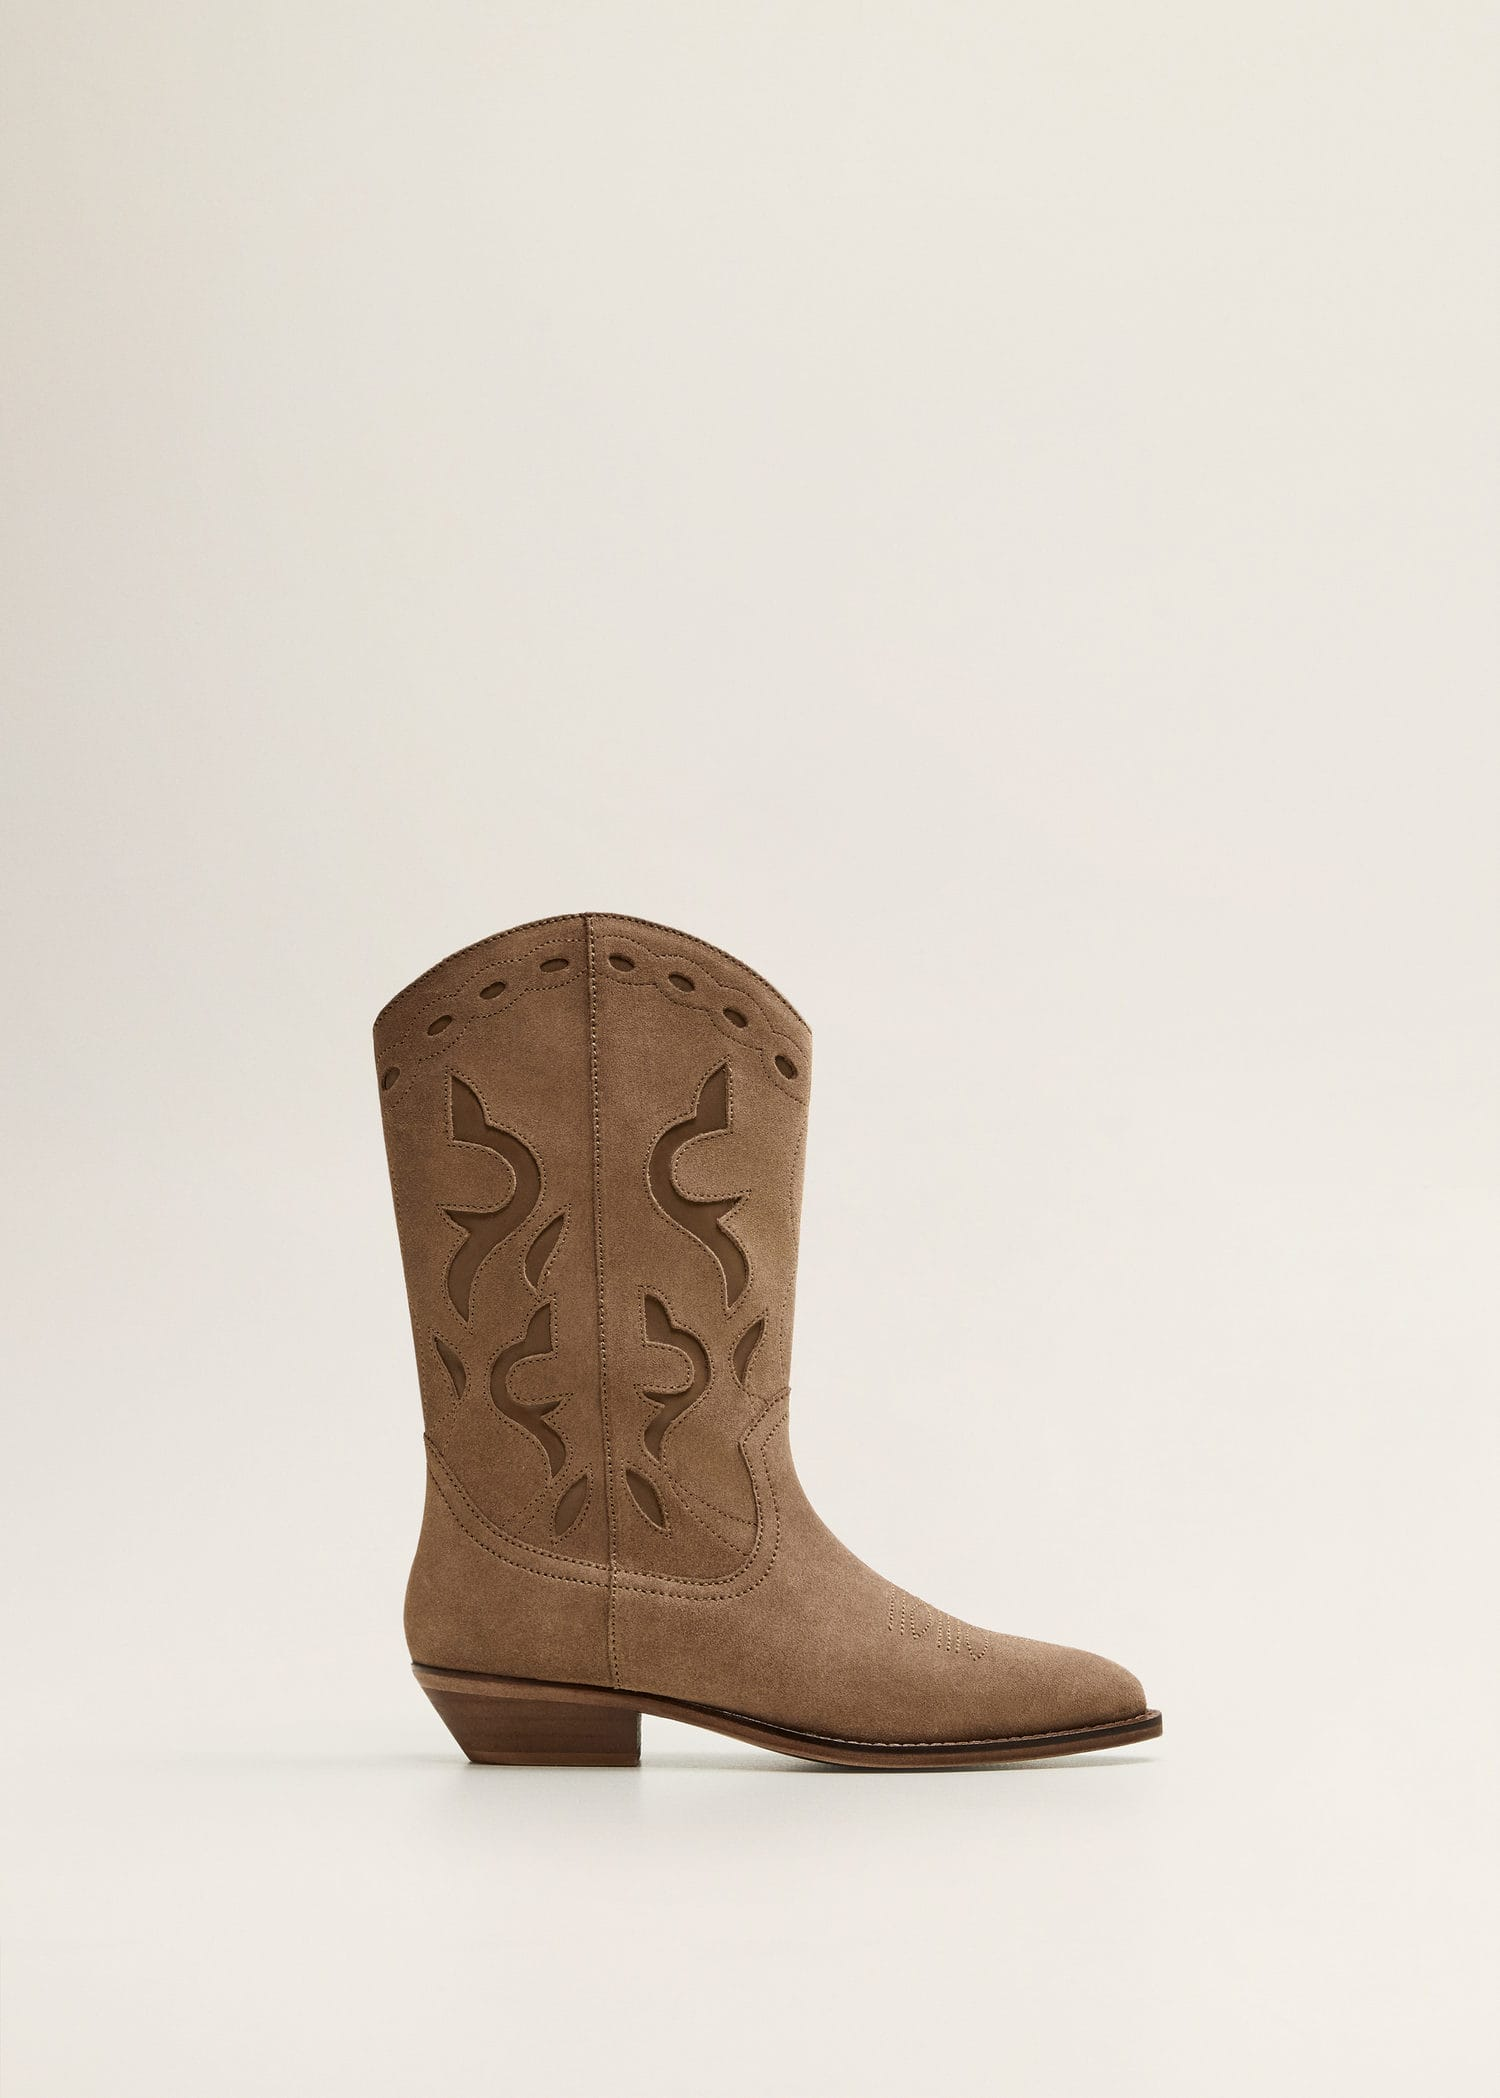 Stivali pelle cowboy